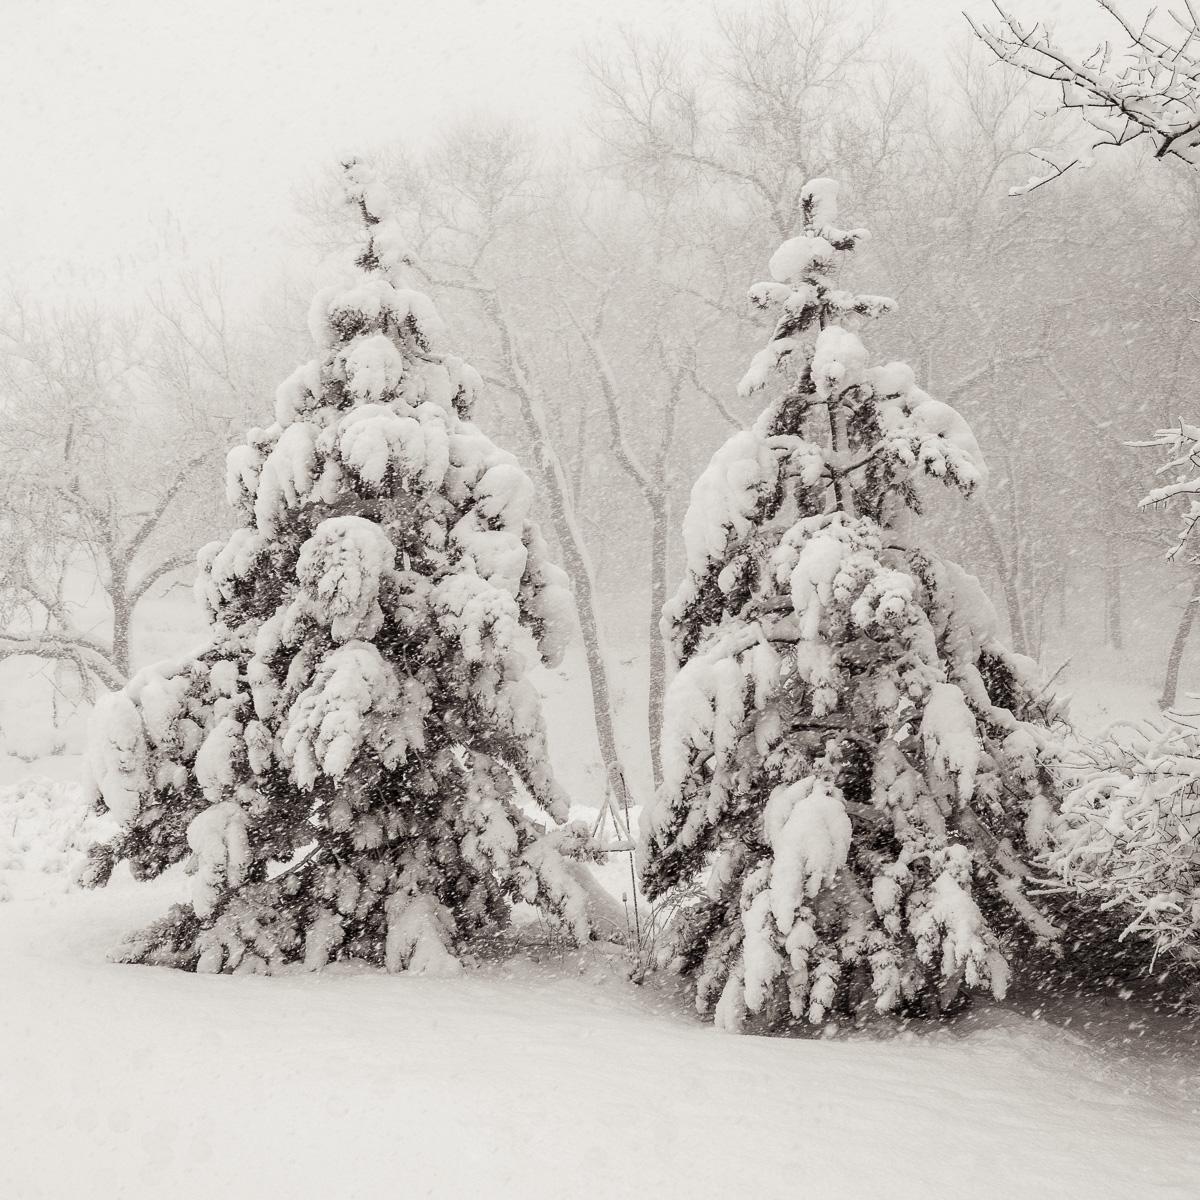 MichaelKnapstein_Winter_Snowfall.jpg